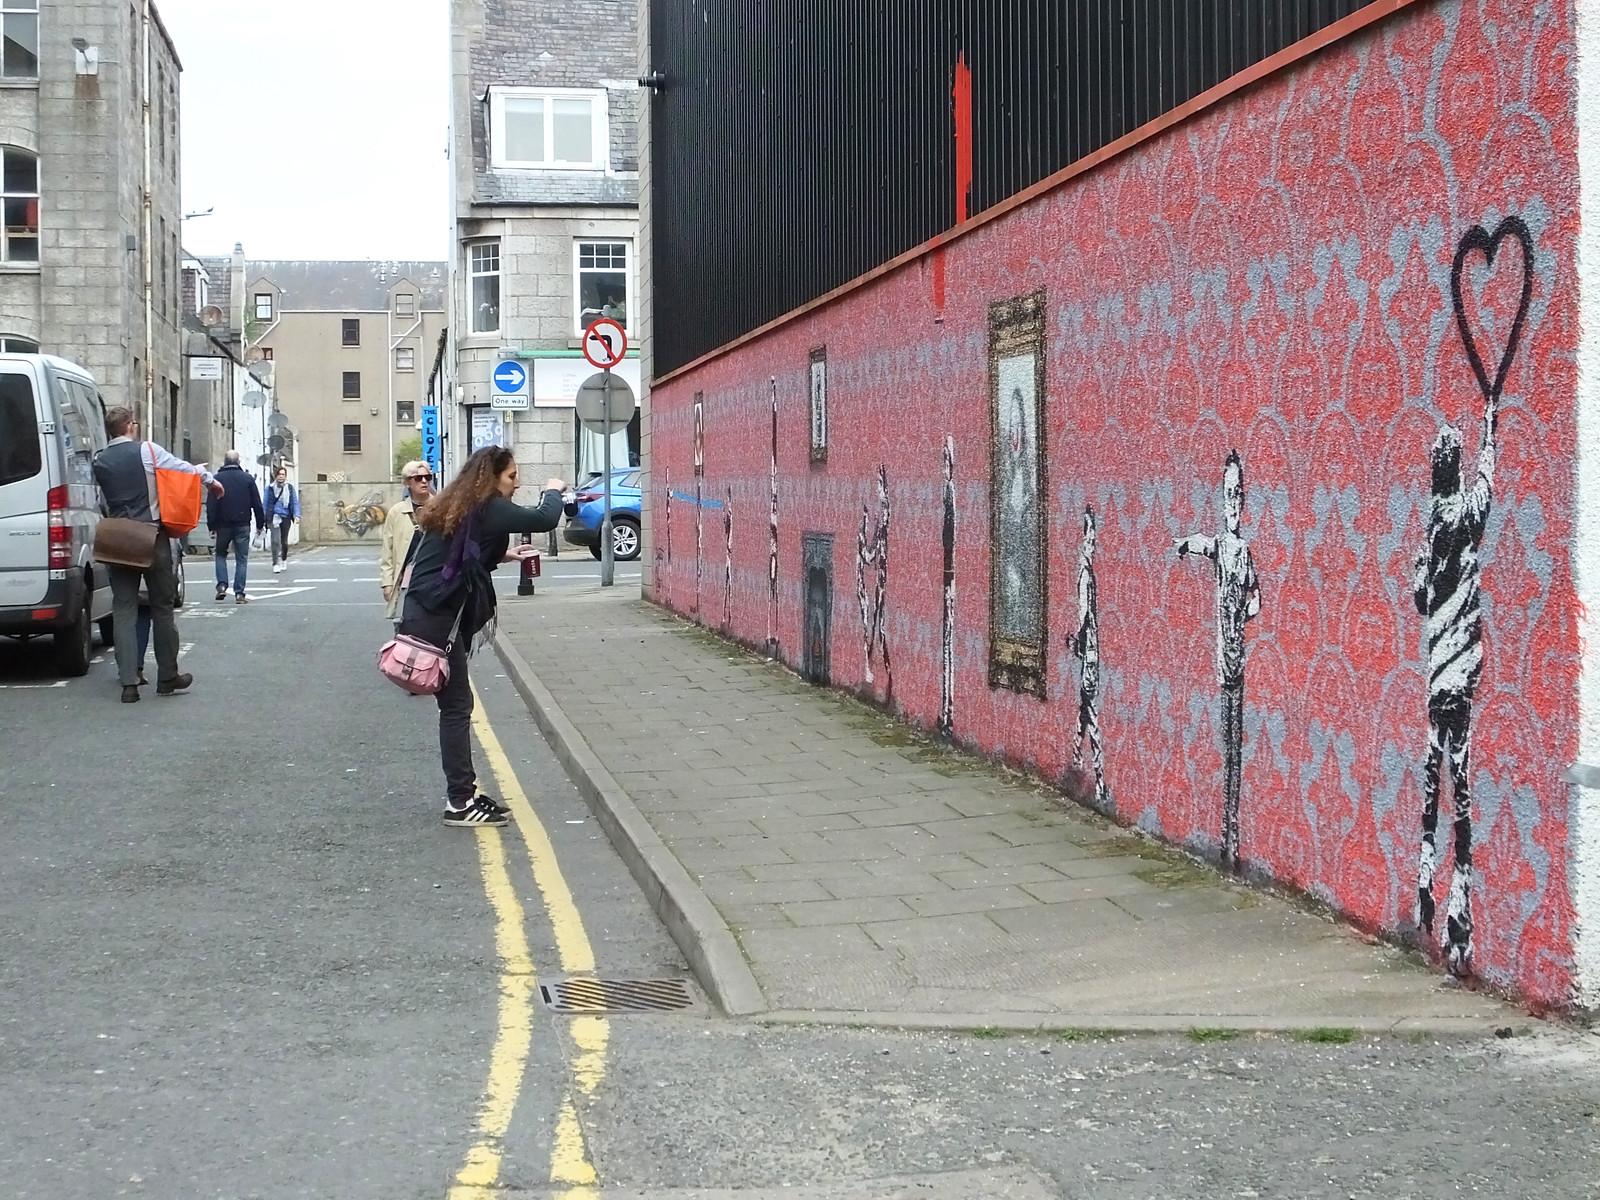 Nuart Aberdeen 2019: Dotmasters